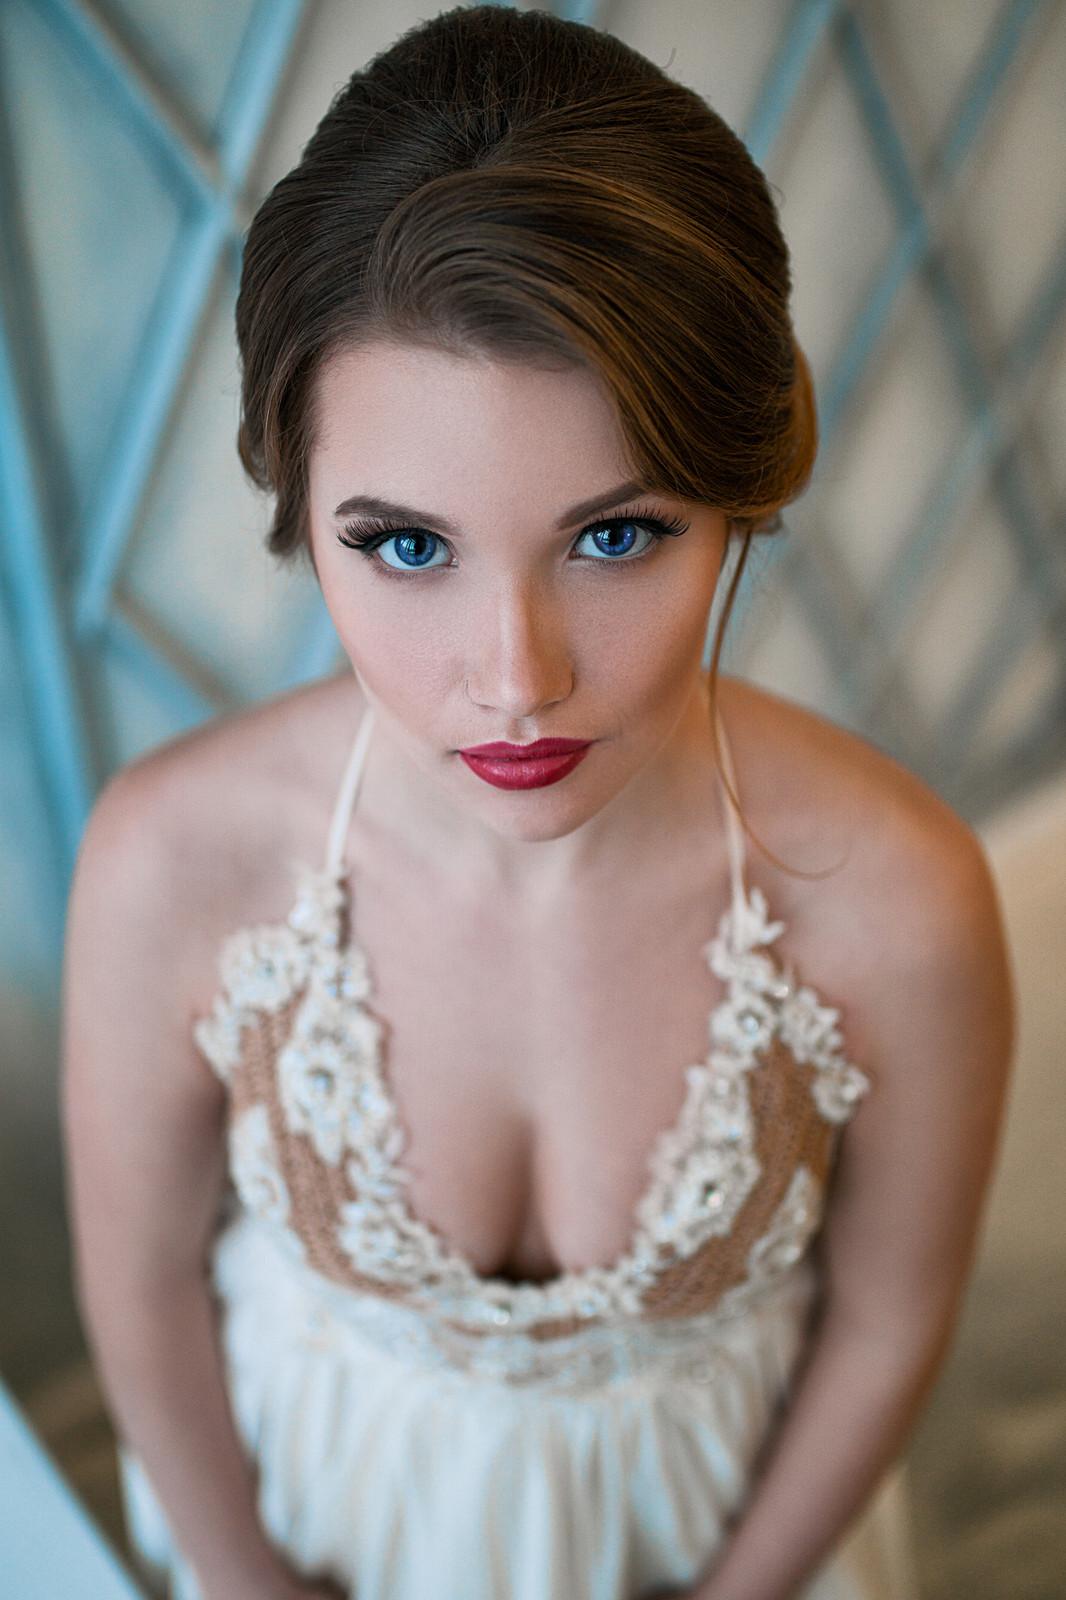 masterbating-car-potential-russian-bride-sexy-naughty